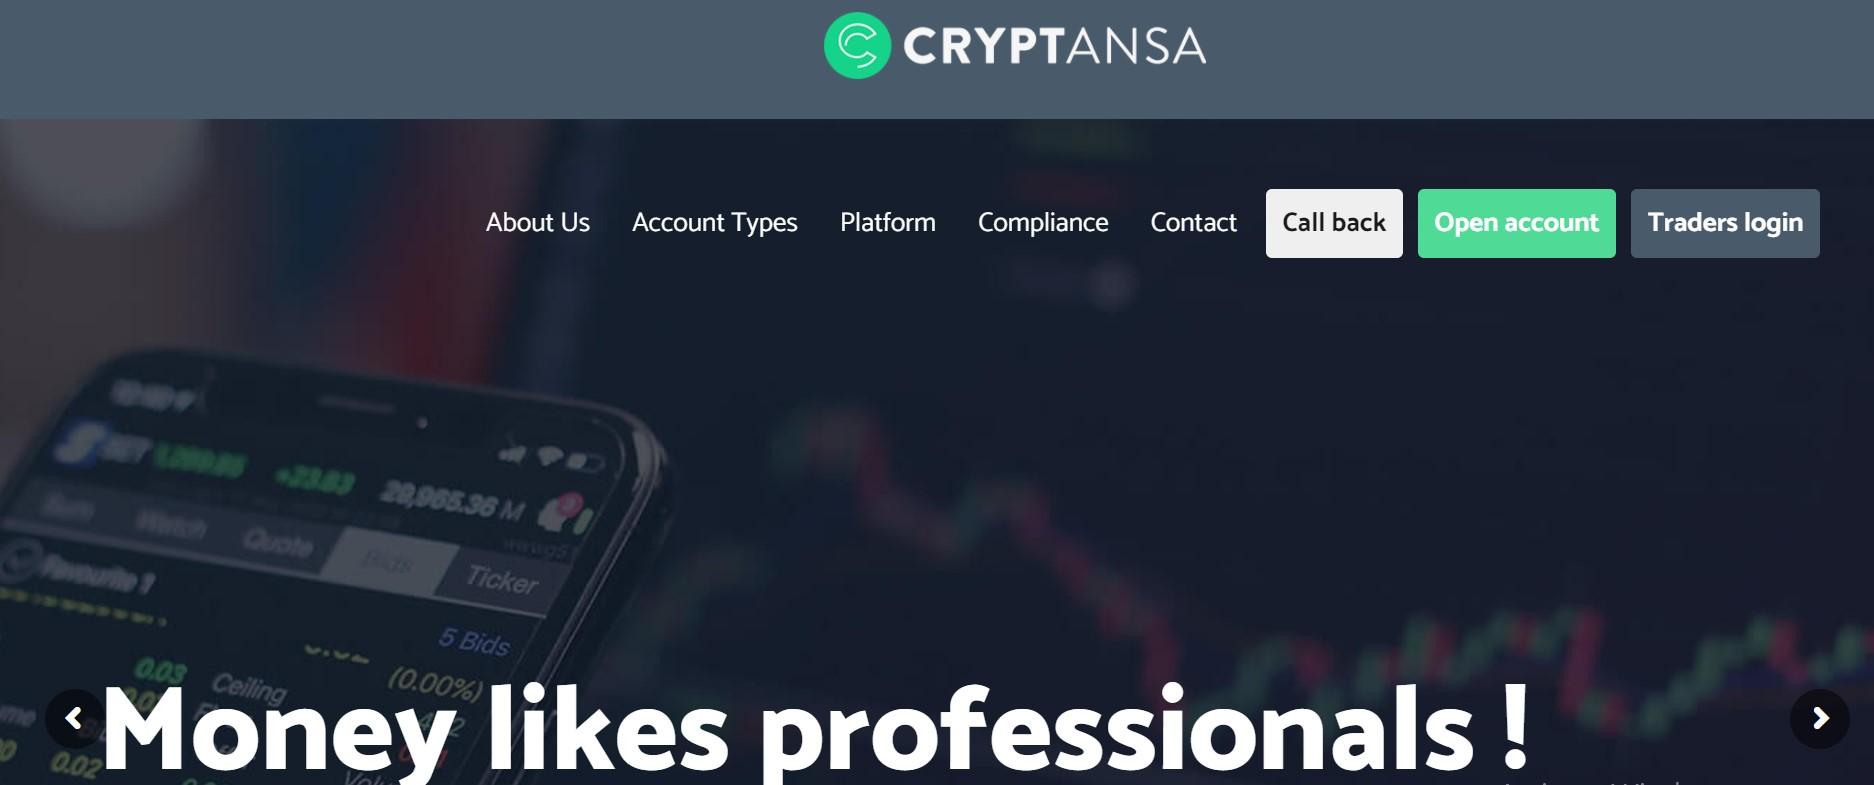 Cryptansa website